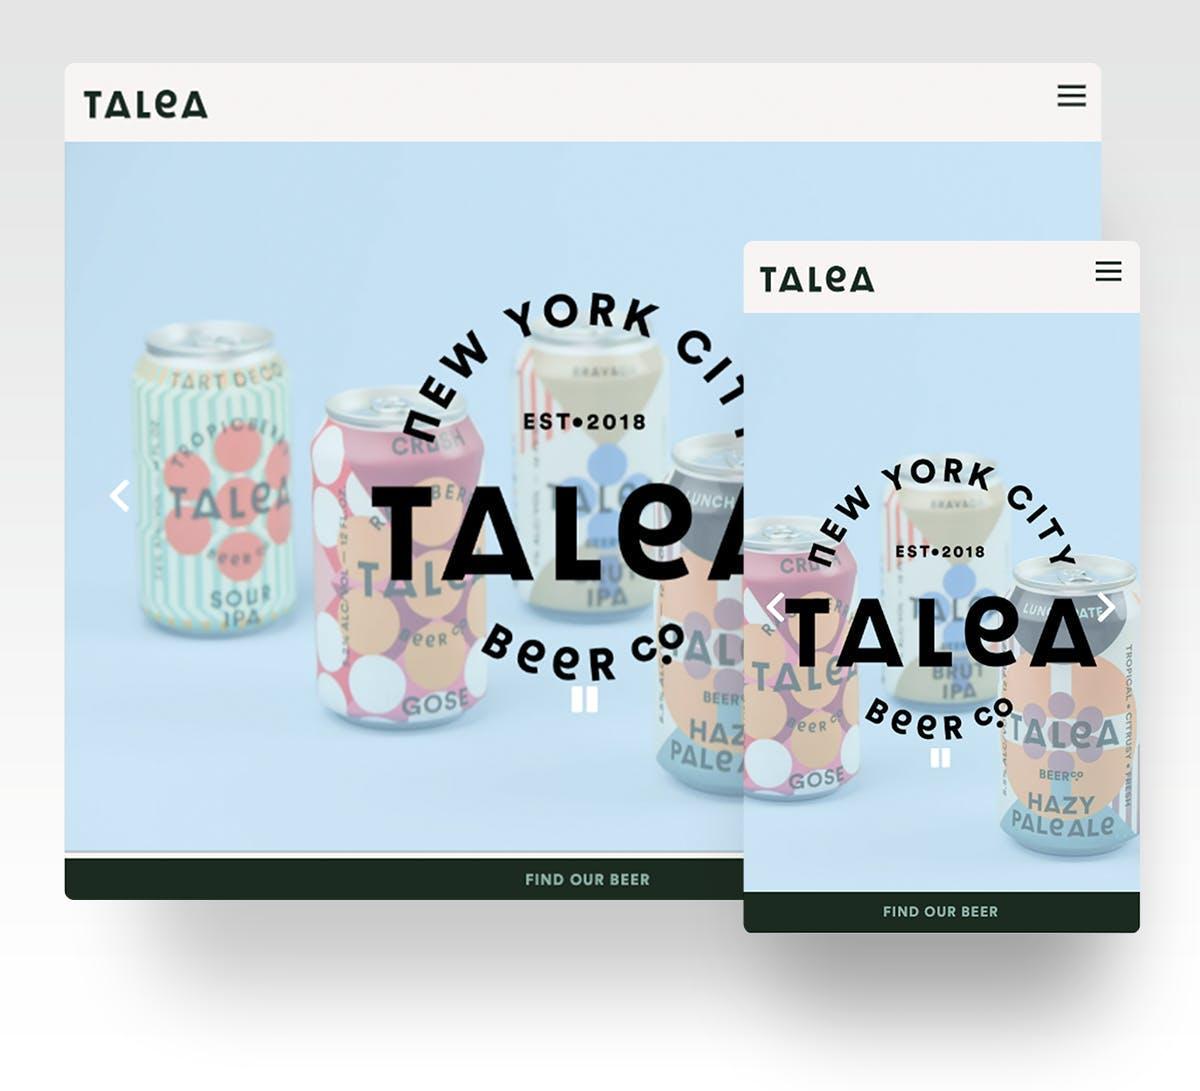 A screenshot of the website homepage of Talea Beer Co.